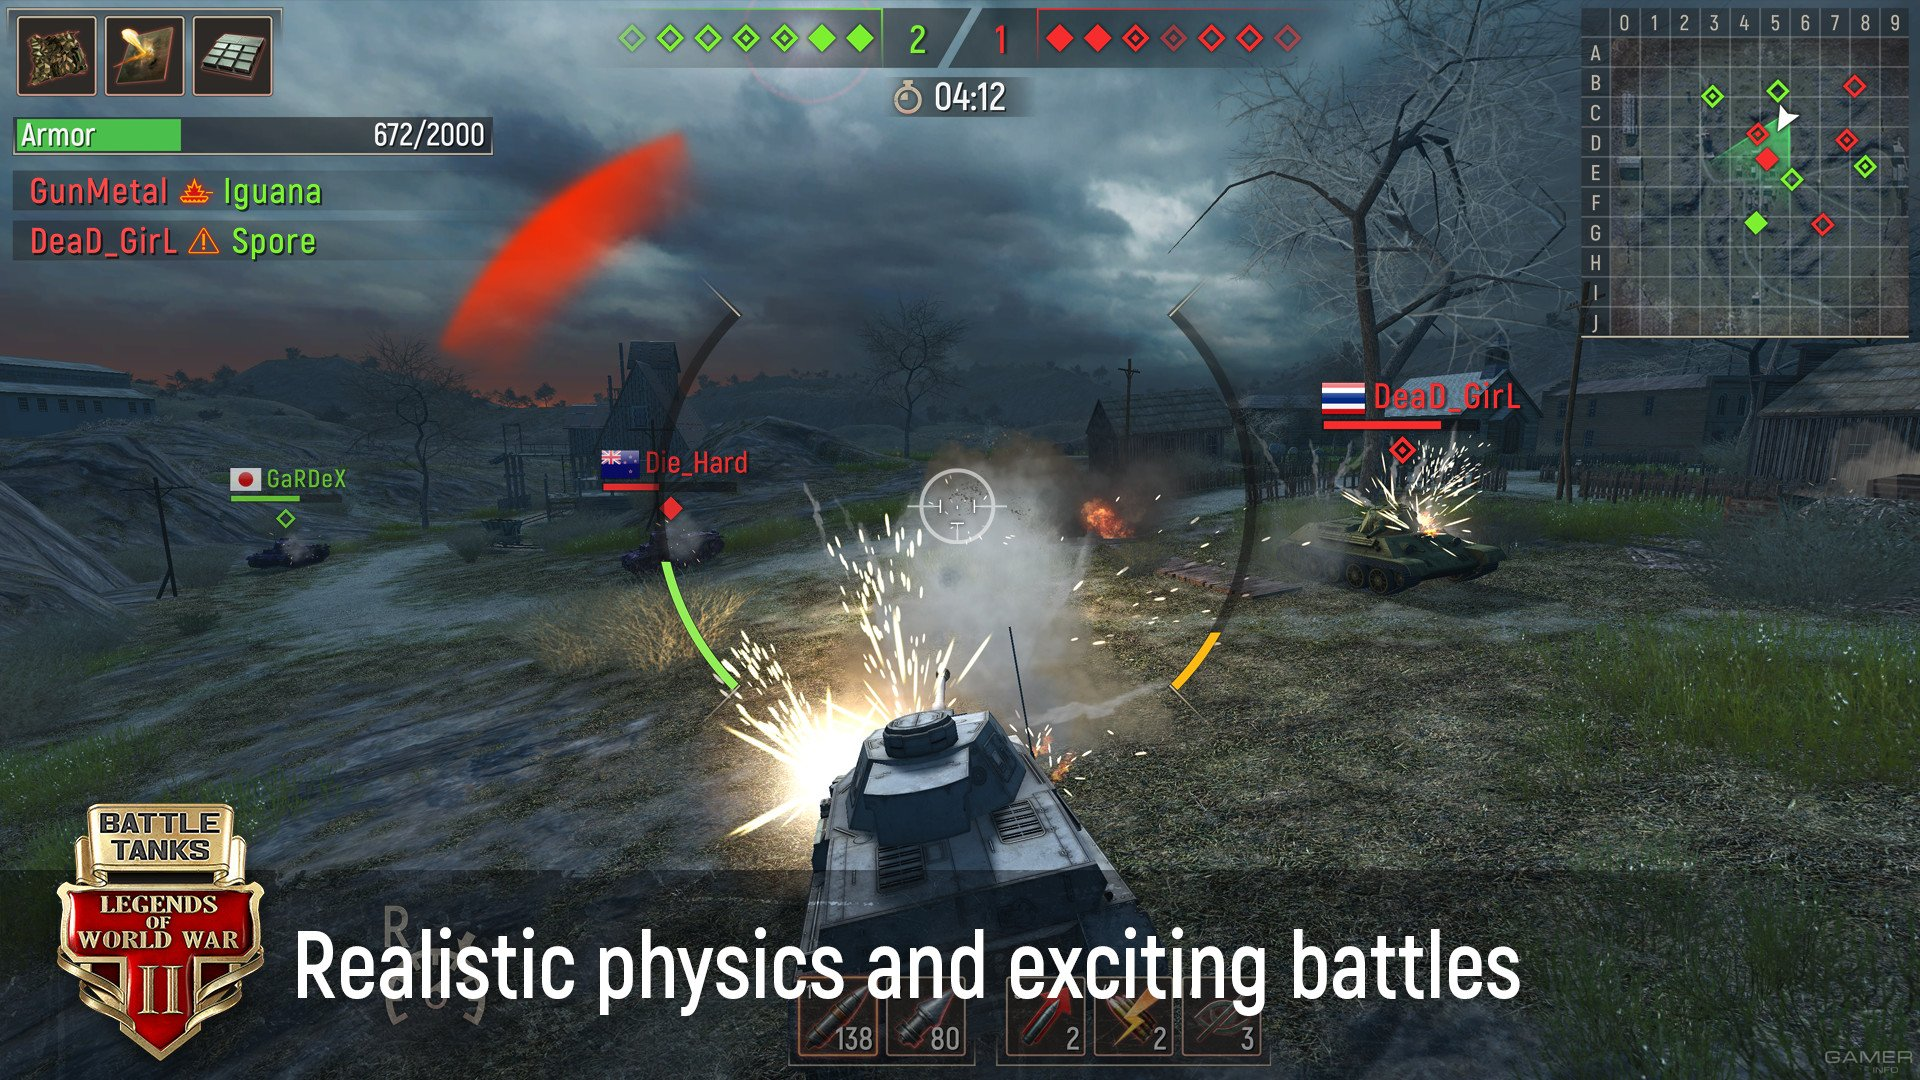 Battle Tanks: Legends of World War II (2019 video game)